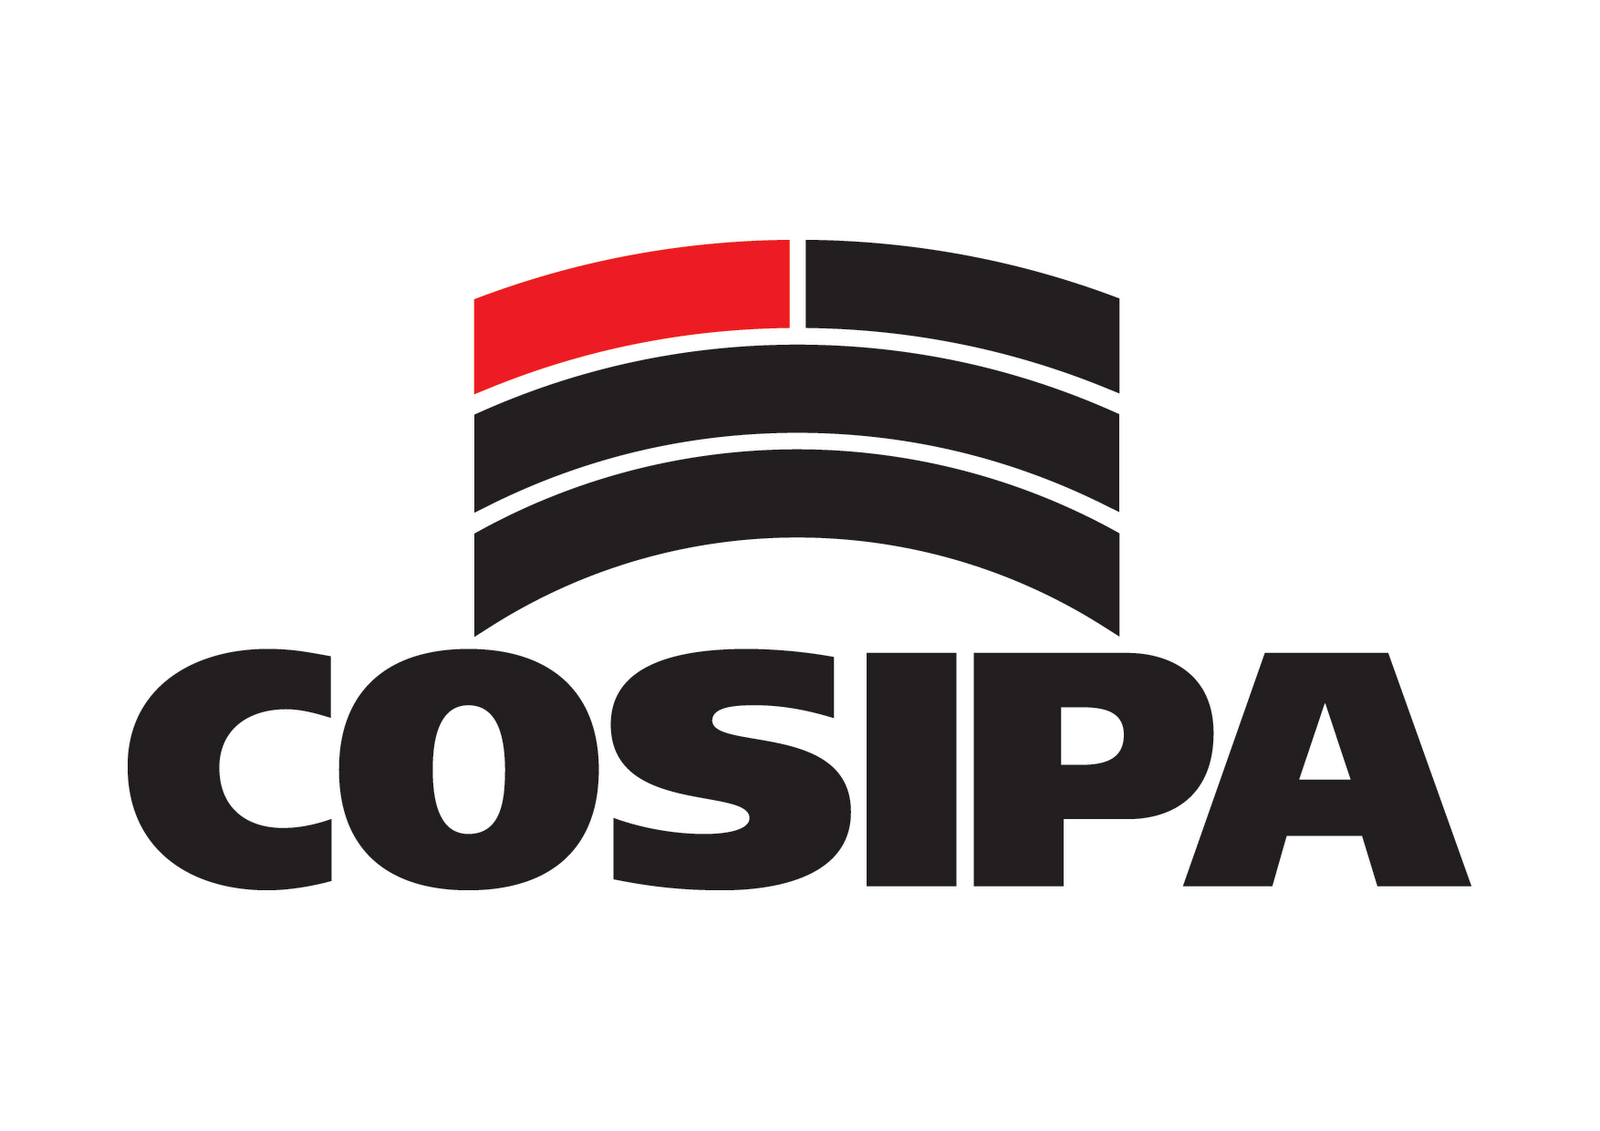 cosipa.png